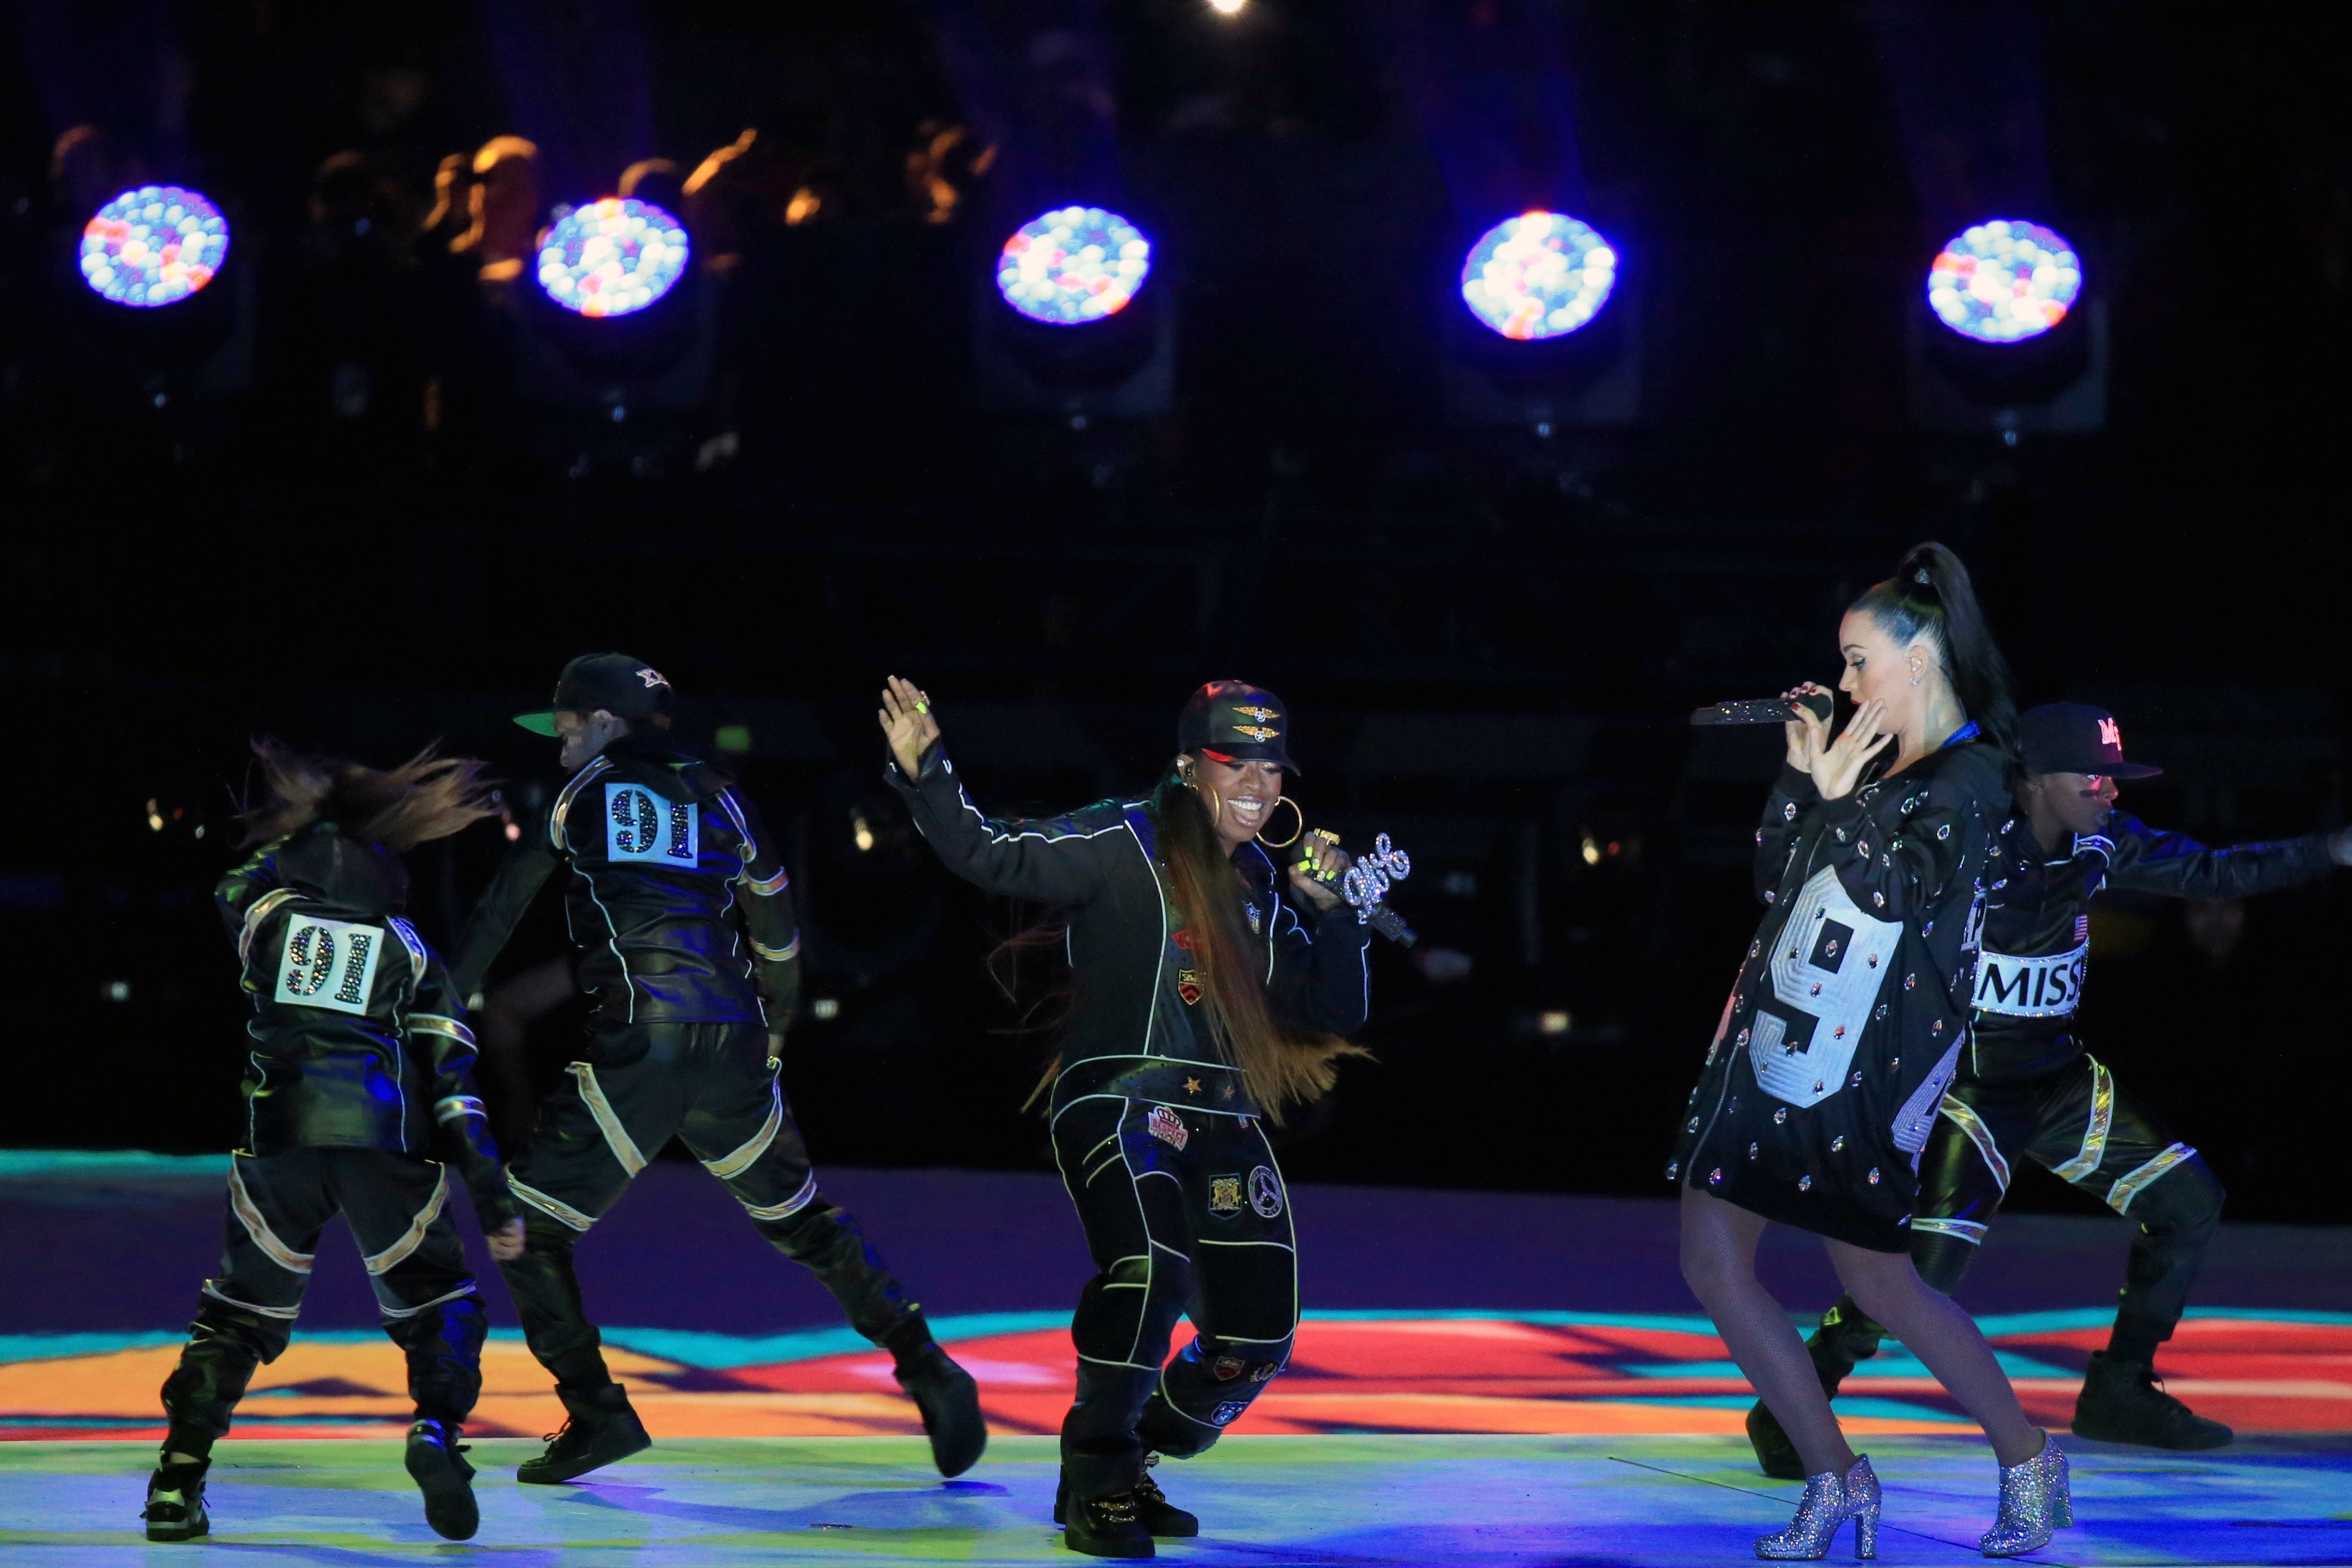 Missy Elliott Steals Super Bowl Halftime Show From Katy regarding Missy Elliott Super Bowl